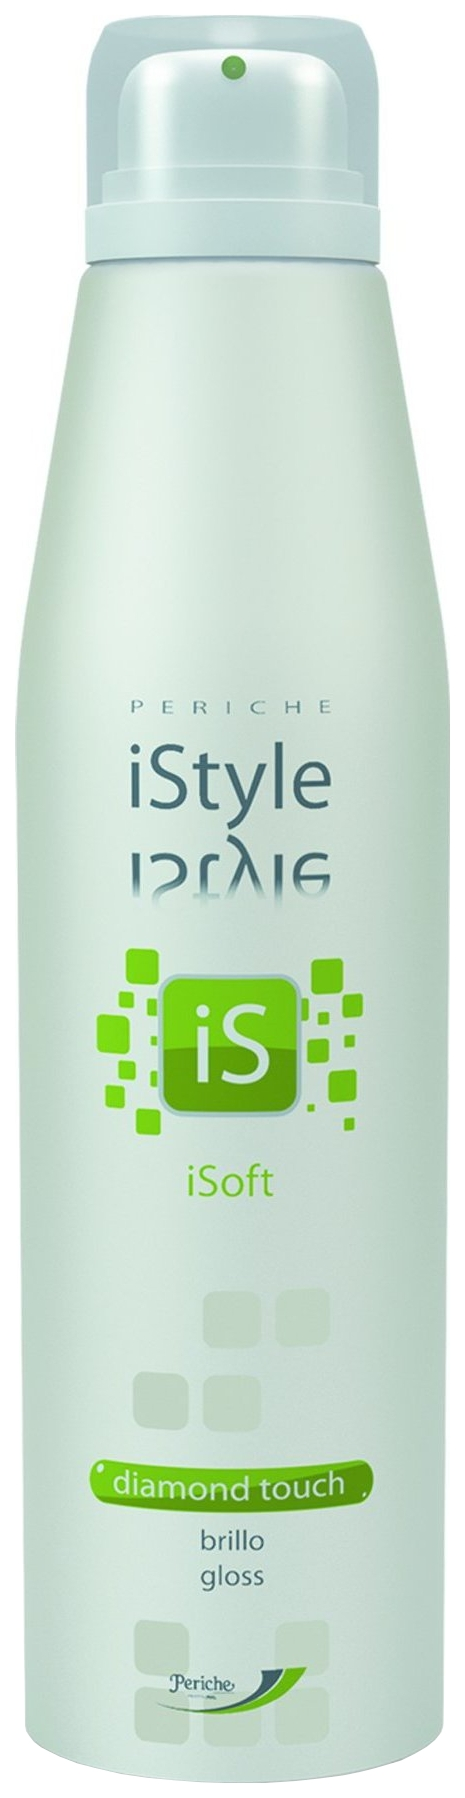 Блеск для волос PERICHE iStyle iSoft Diamond Touch